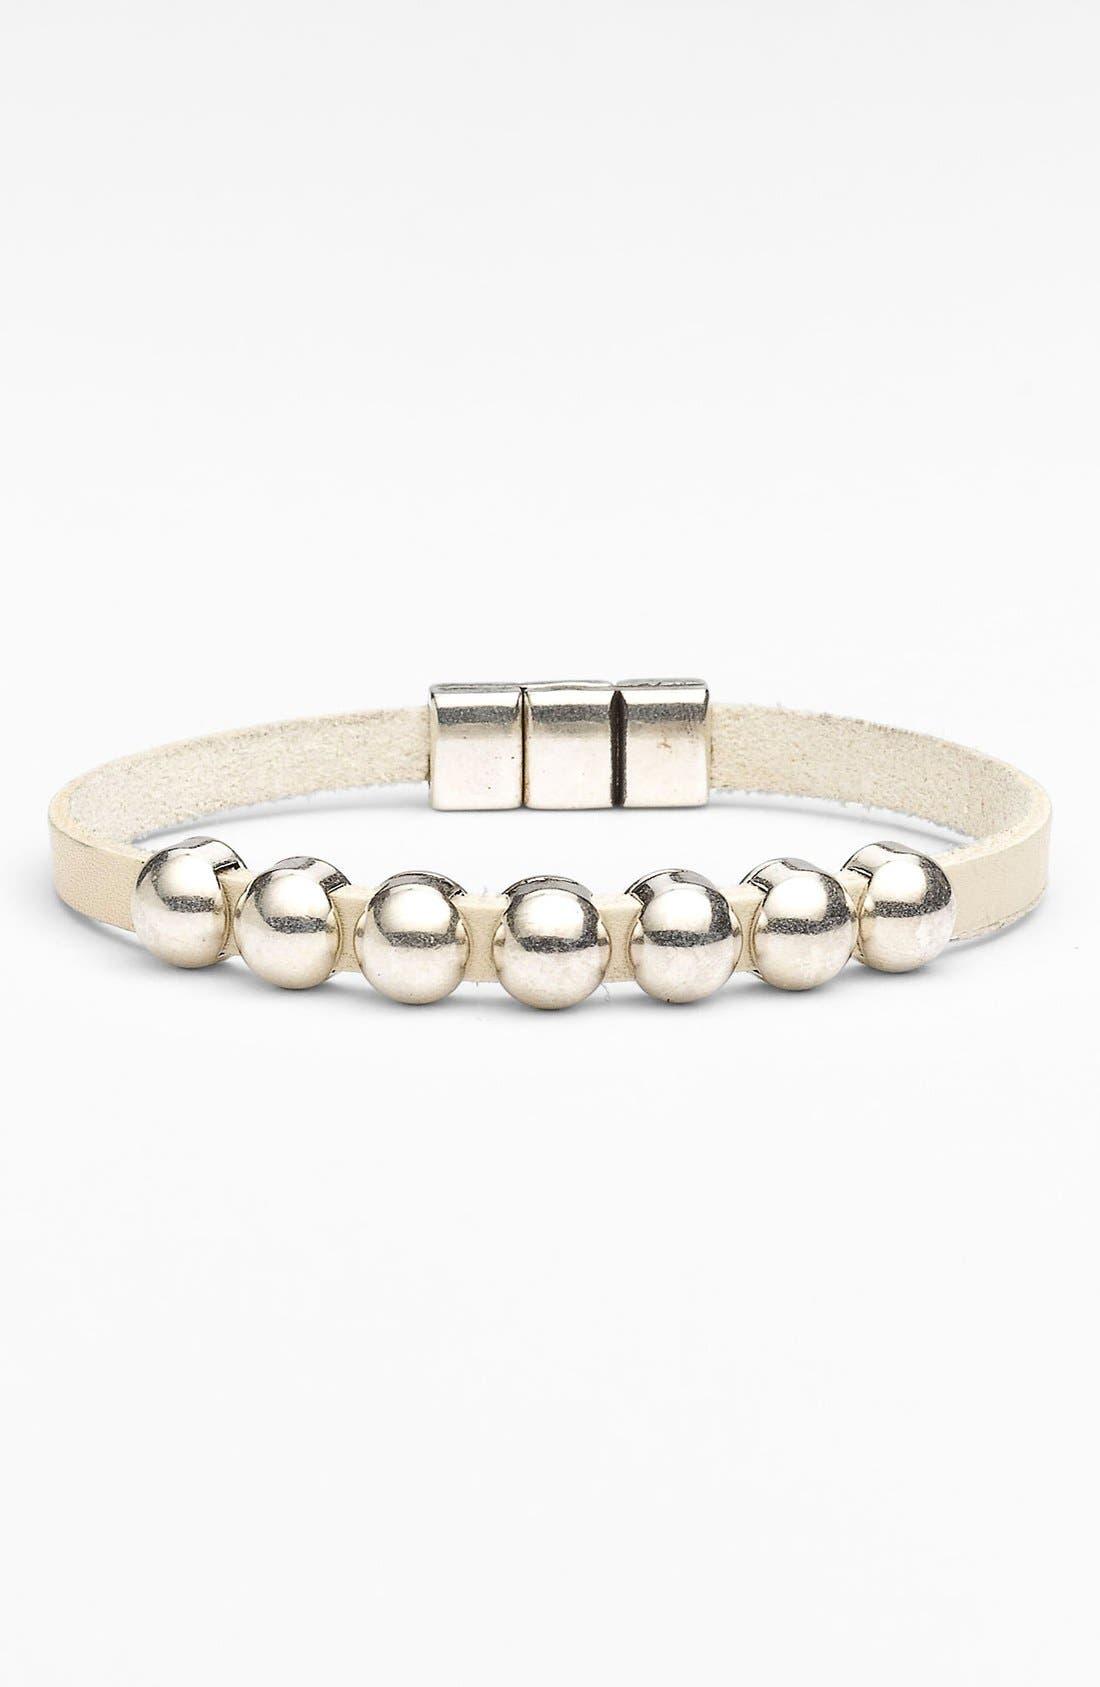 Alternate Image 1 Selected - Will Leather Goods Bracelet